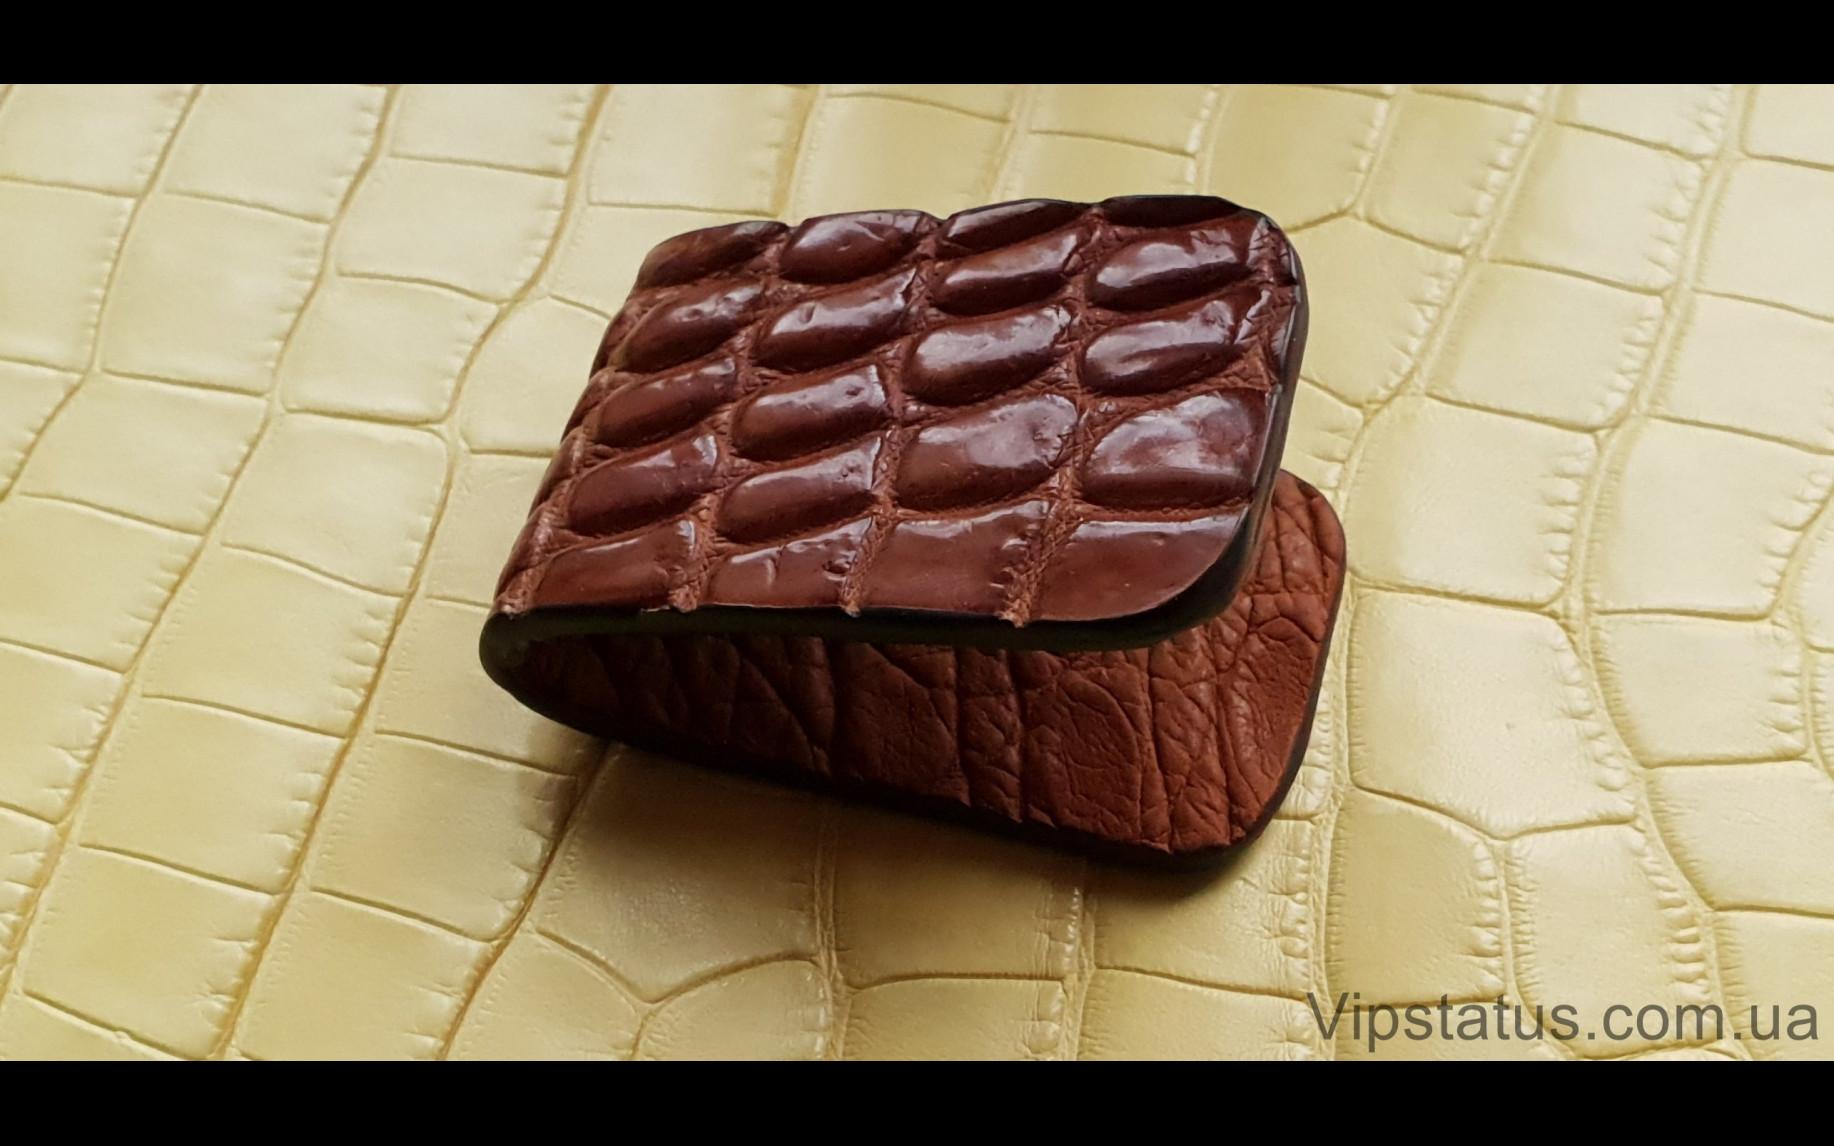 Elite Brown Gloss Люксовый зажим для купюр Brown Gloss Luxury bill clip image 1